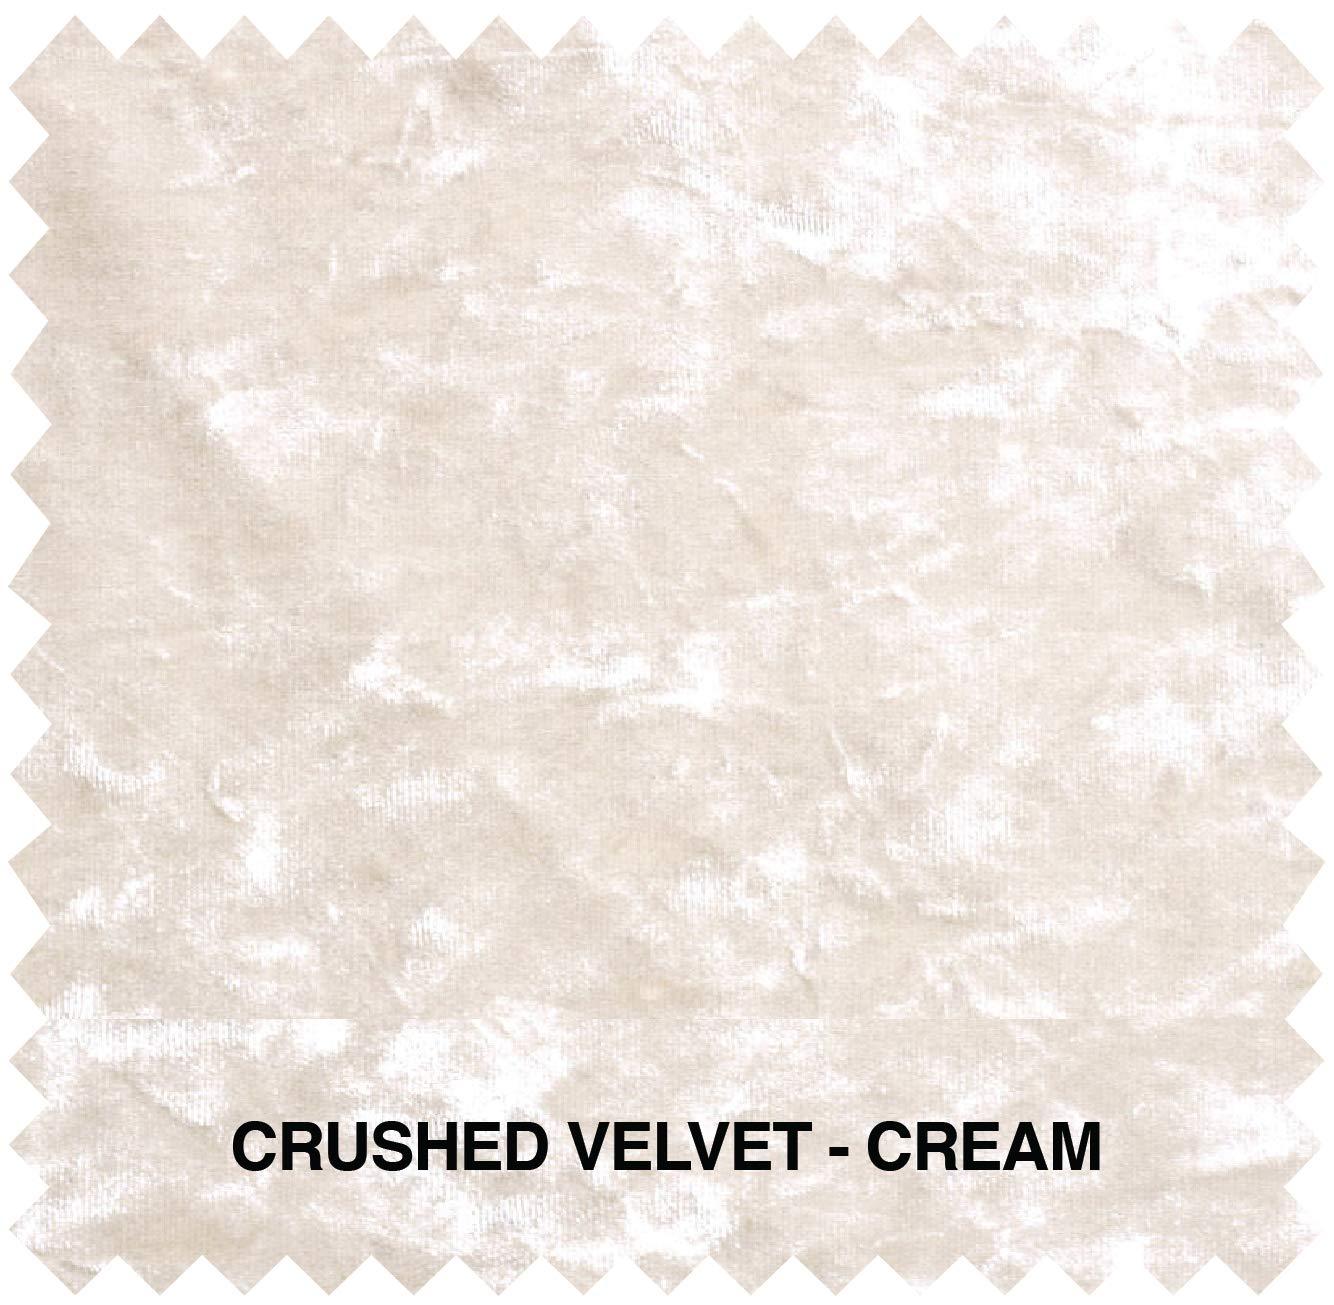 Under Storage NO Mattress /& 2 Drawers Single - 30, Black Crushed Velvet Divan Bed Ibex Plus Extra